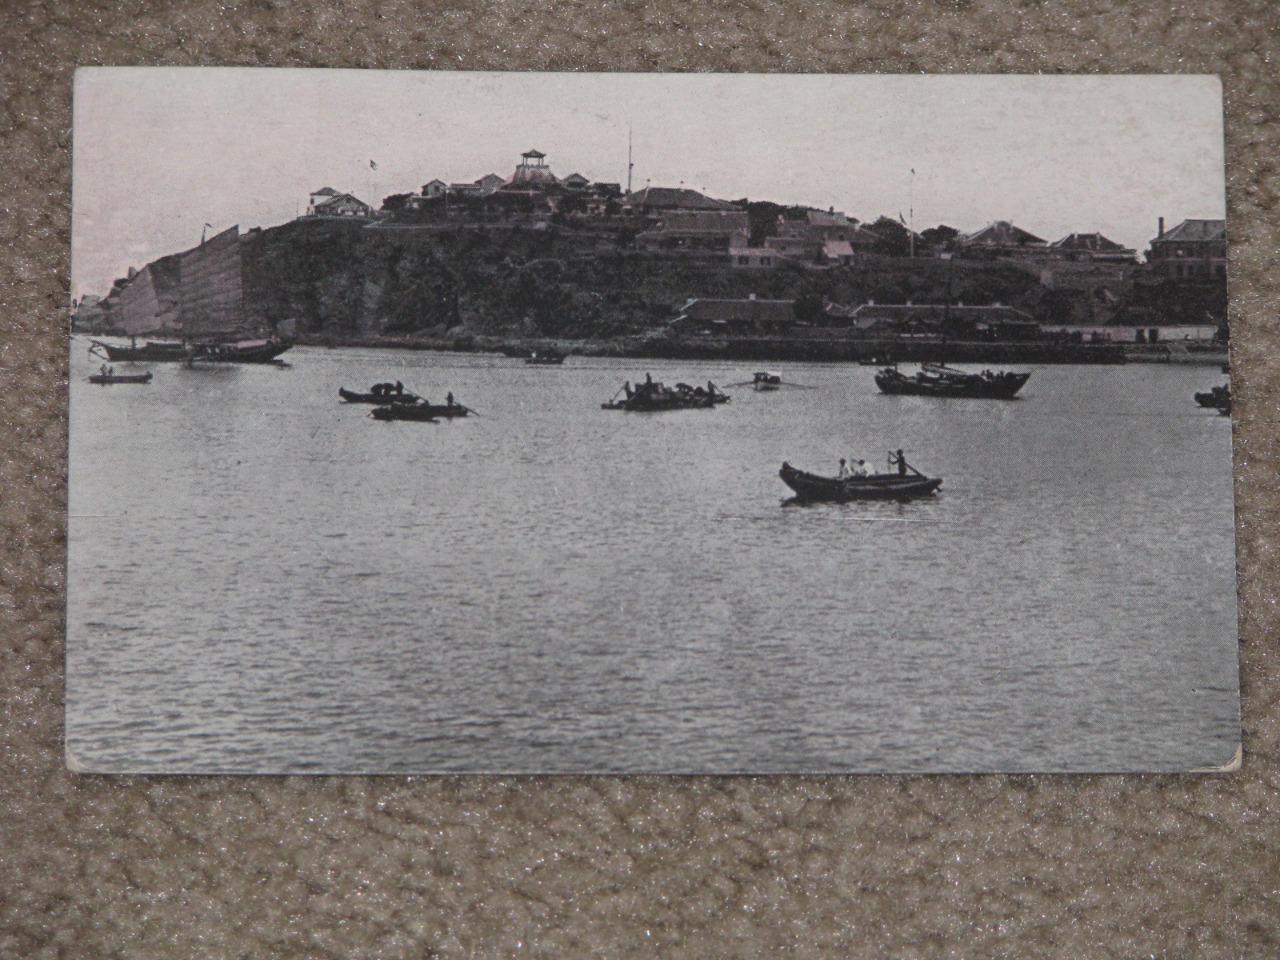 Chefoo Harbor, China, Great Gateway to China, 1910, used vintage card